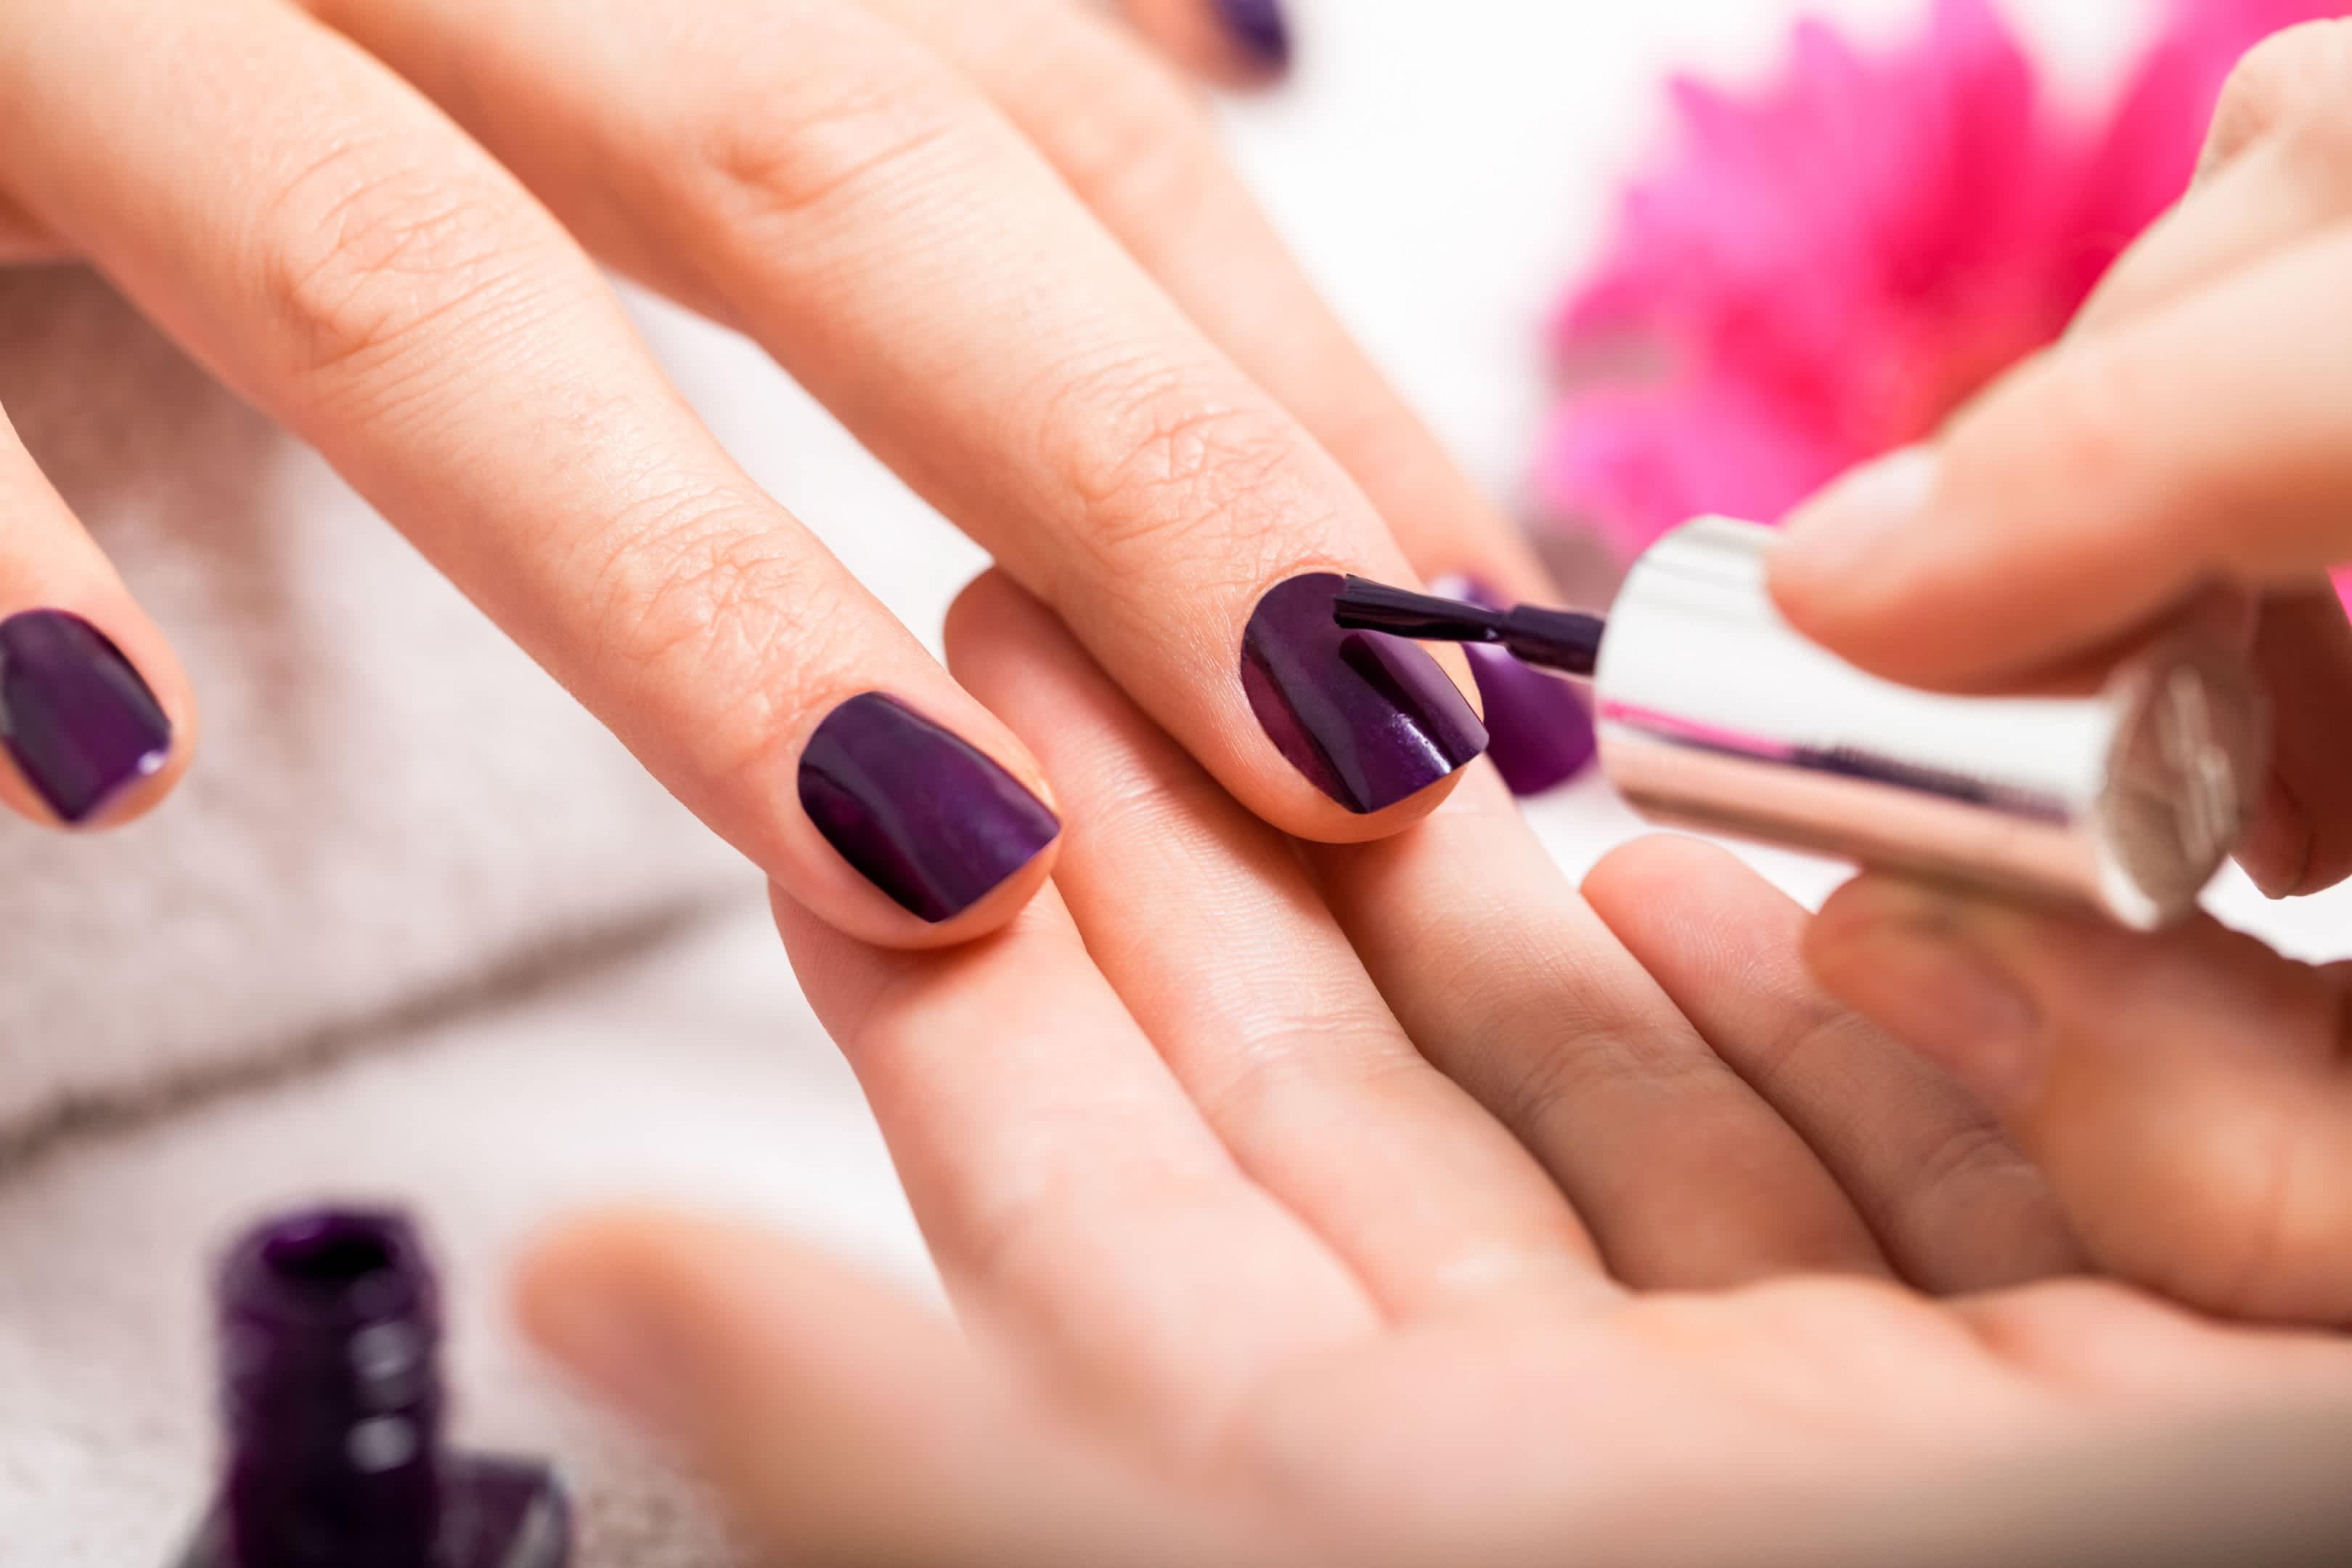 Gel polish on fingers